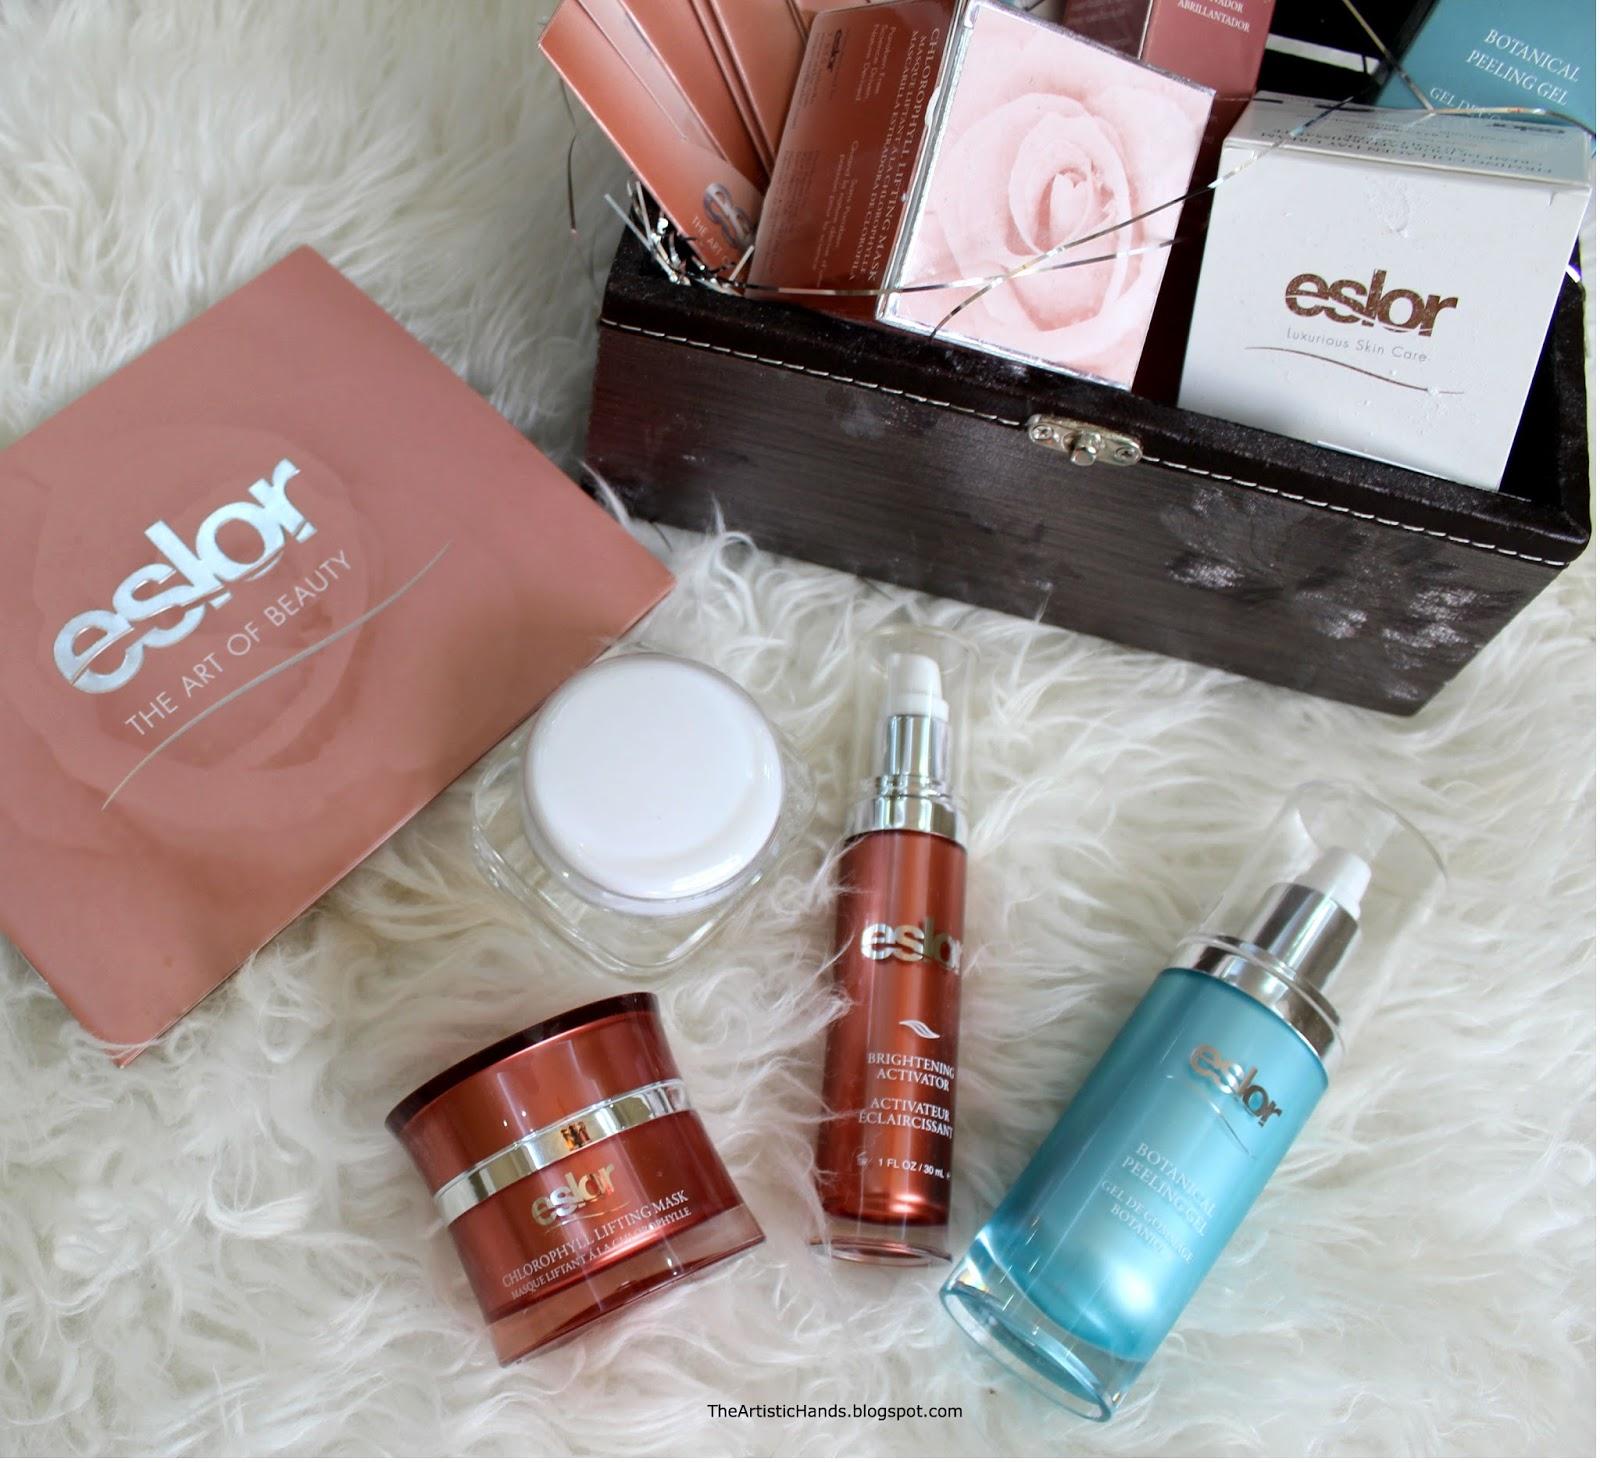 2e7d92fff60fb Eslor Skincare Products Review and Discount Code ريفيو منتجات العناية  بالبشرة من ايسلور مع طريقة الطلب وكود تخفيض